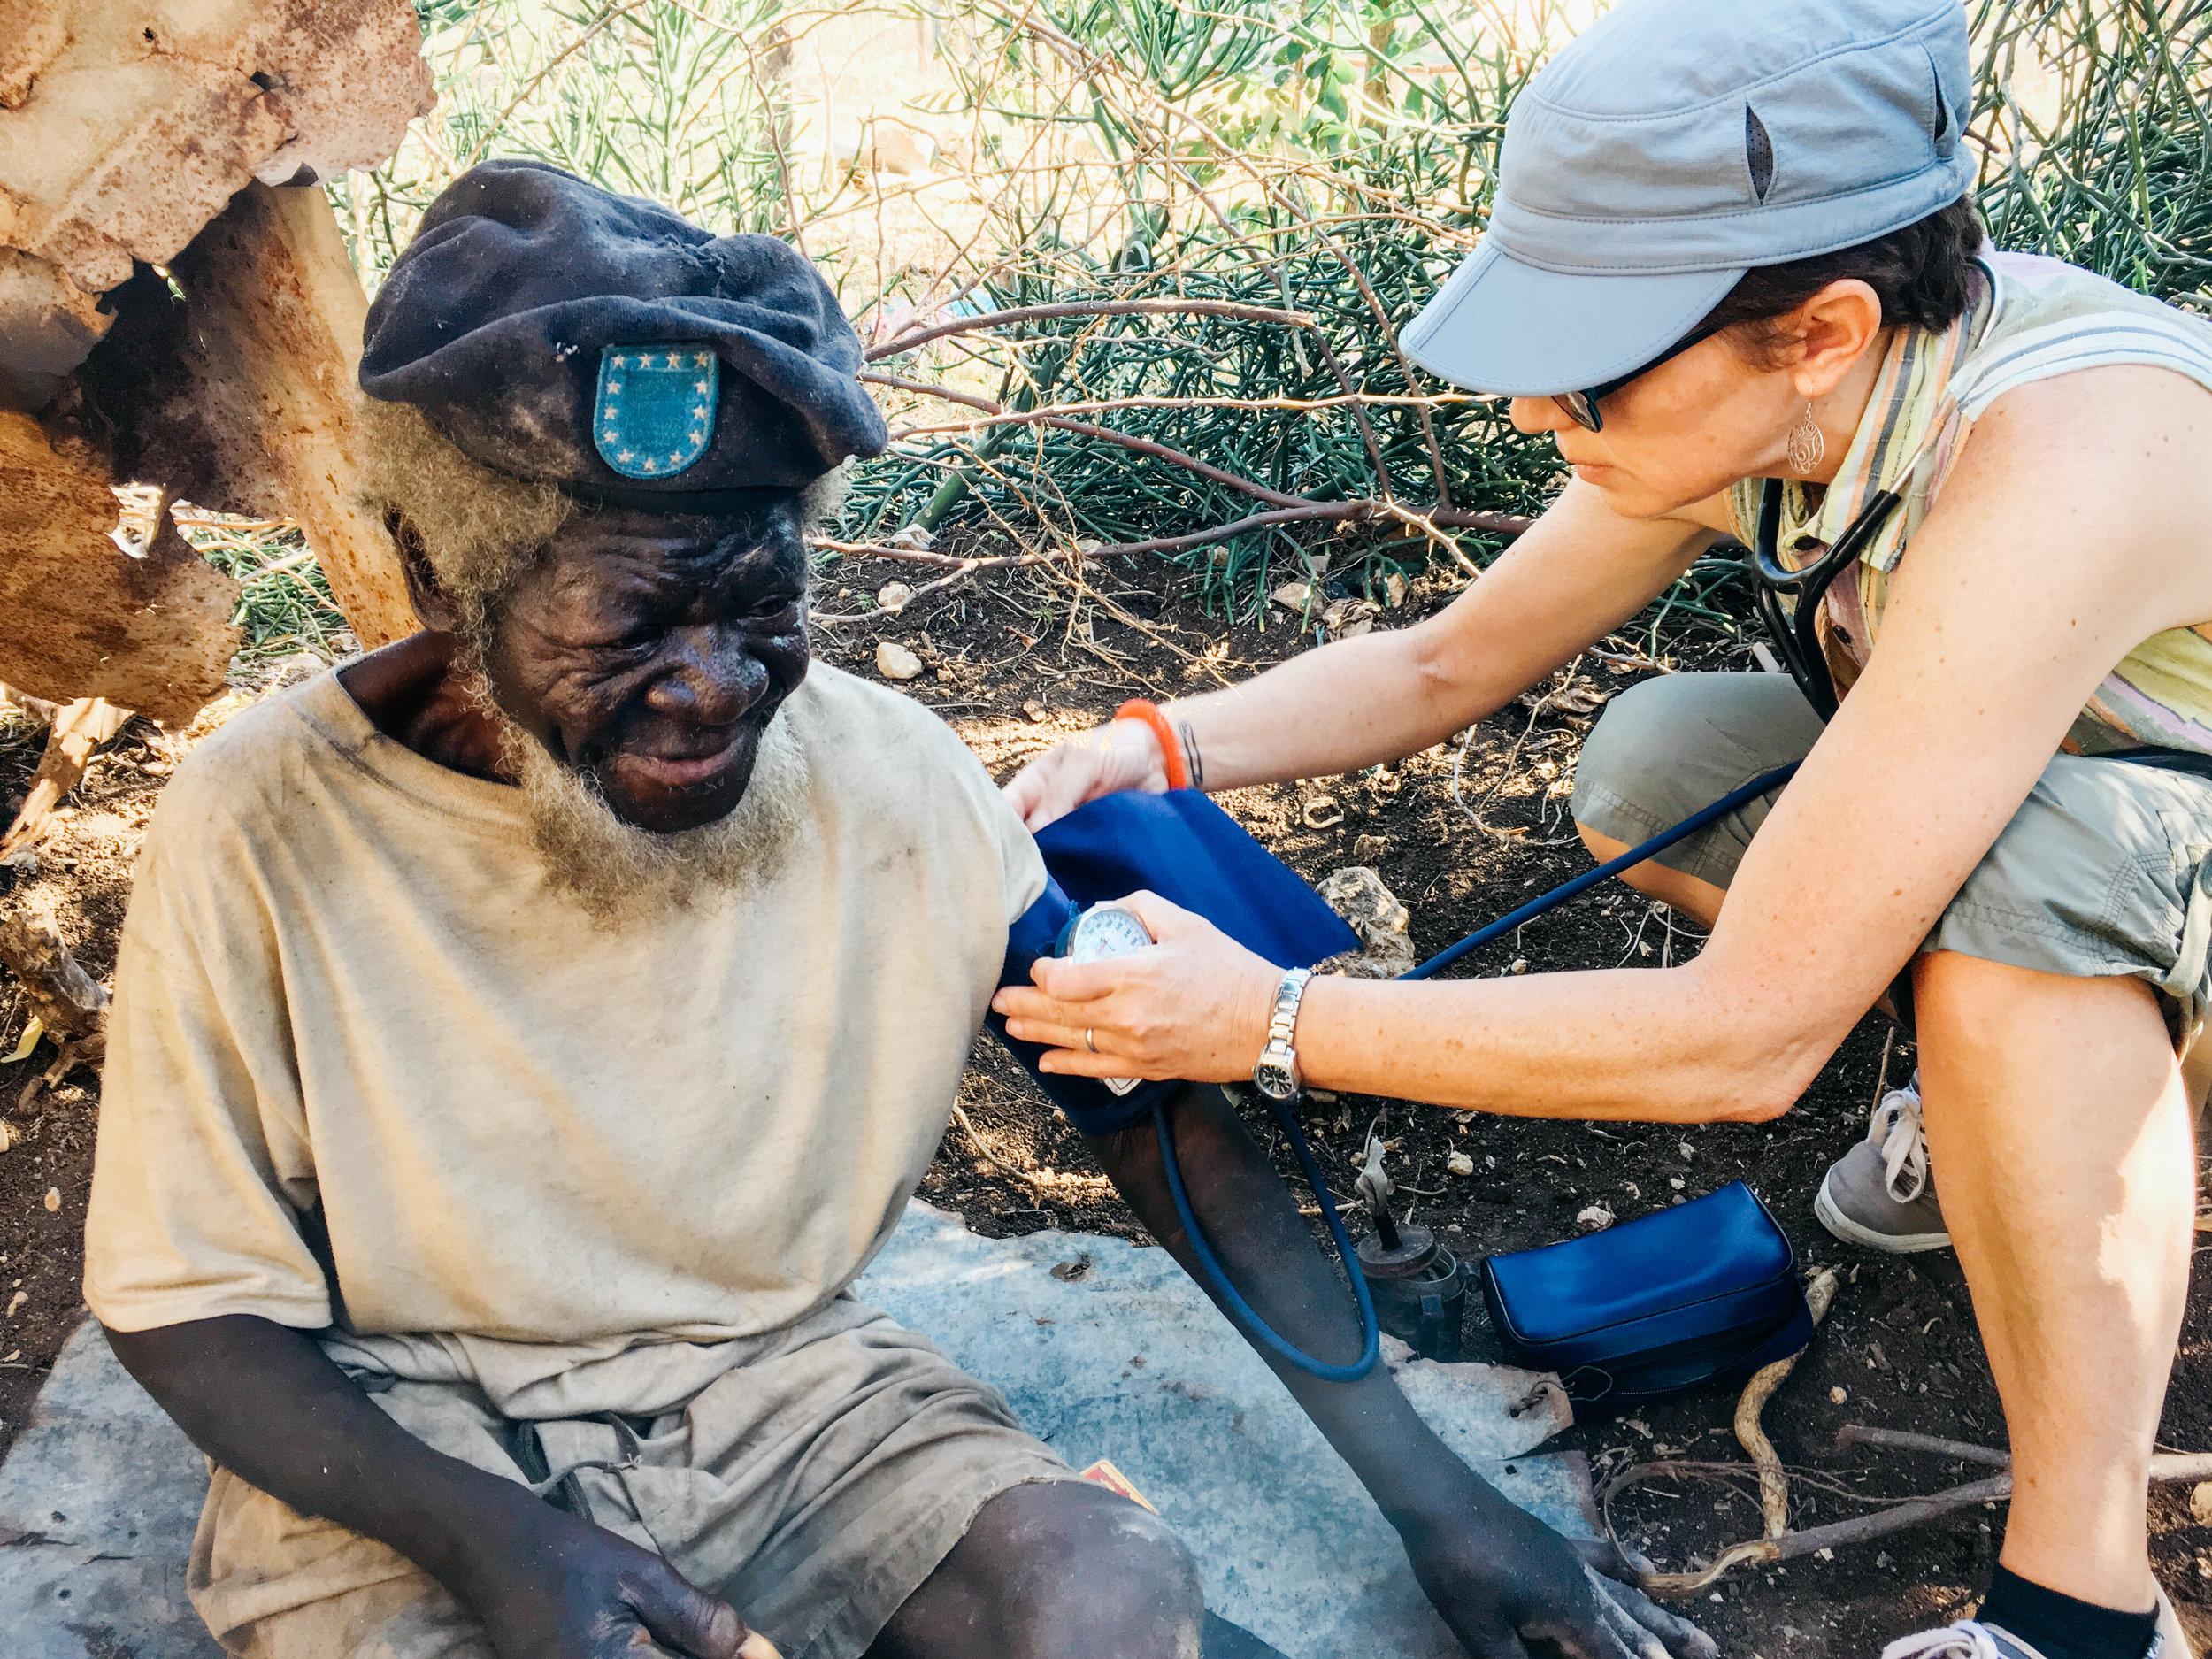 Haiti_Medical_missions_healthcare_healing_art_missions_05.JPG